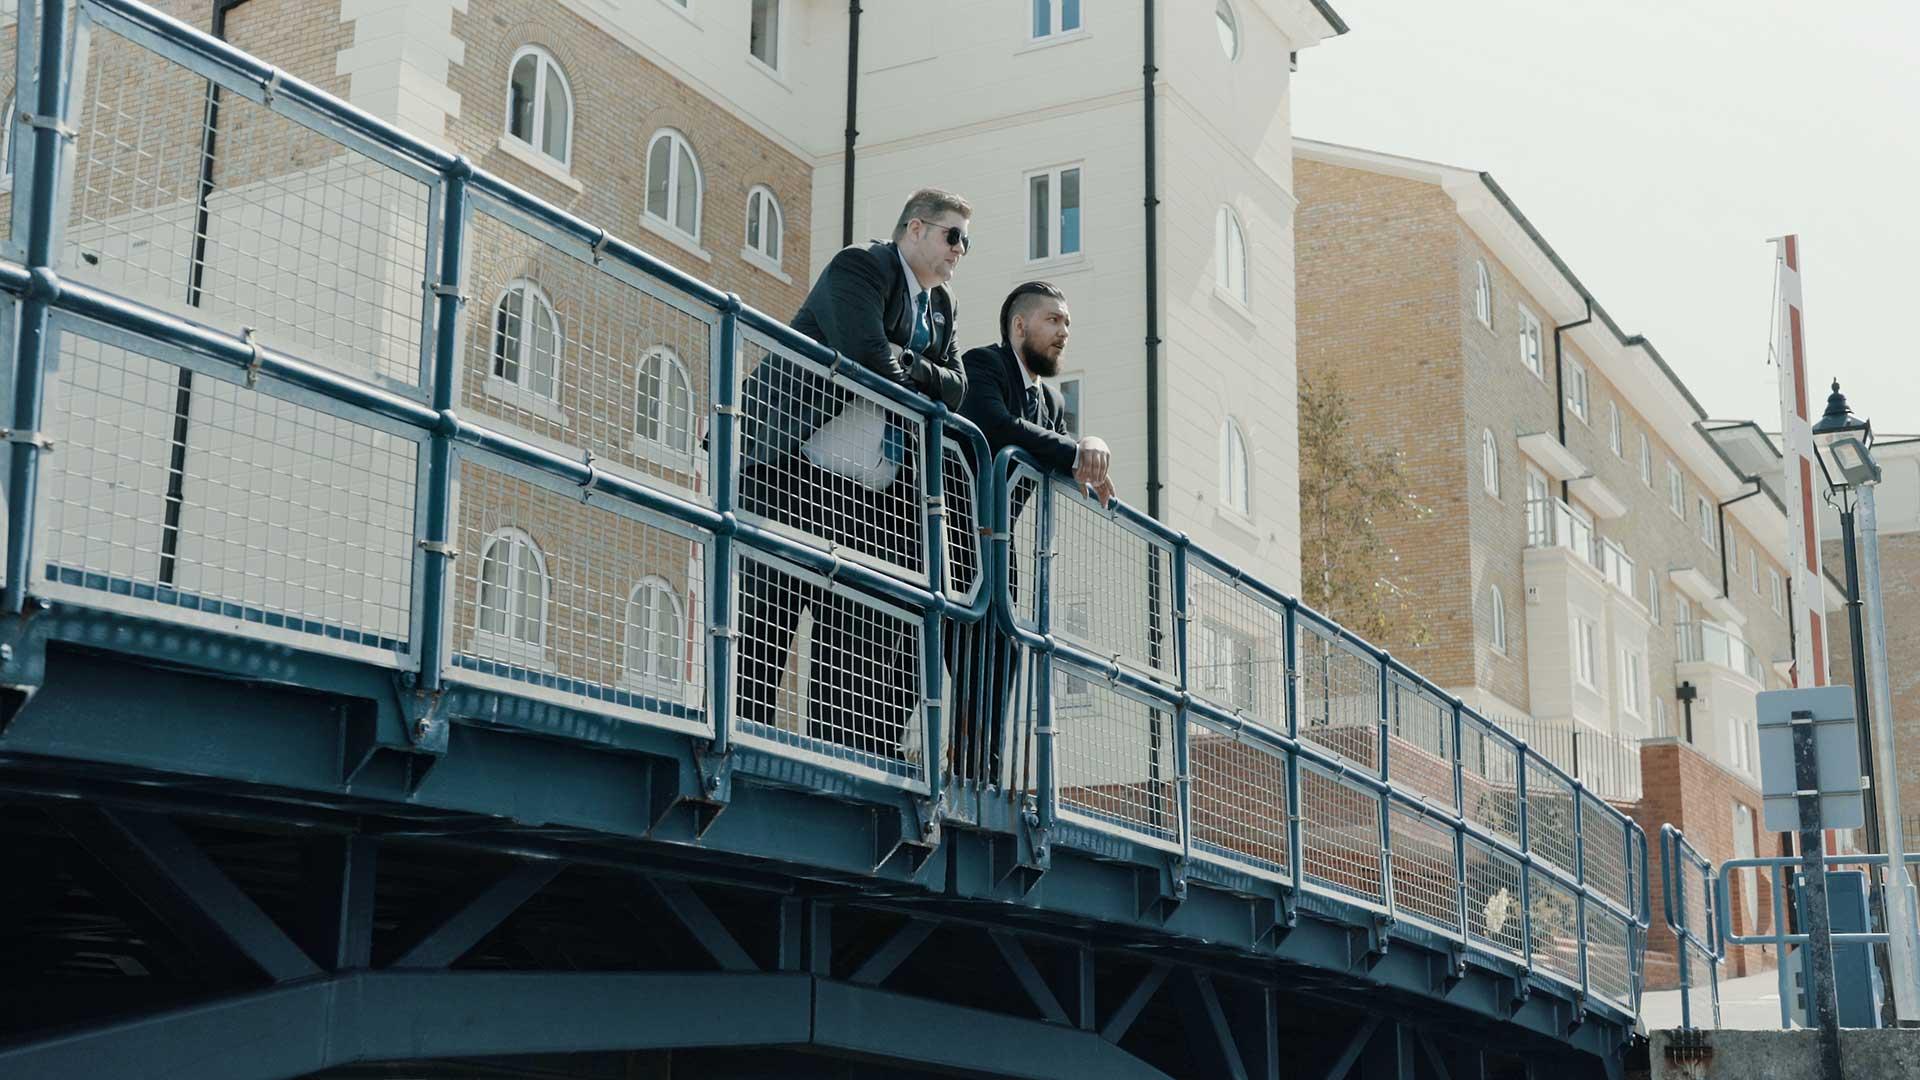 AP Security guards patrolling a bridge